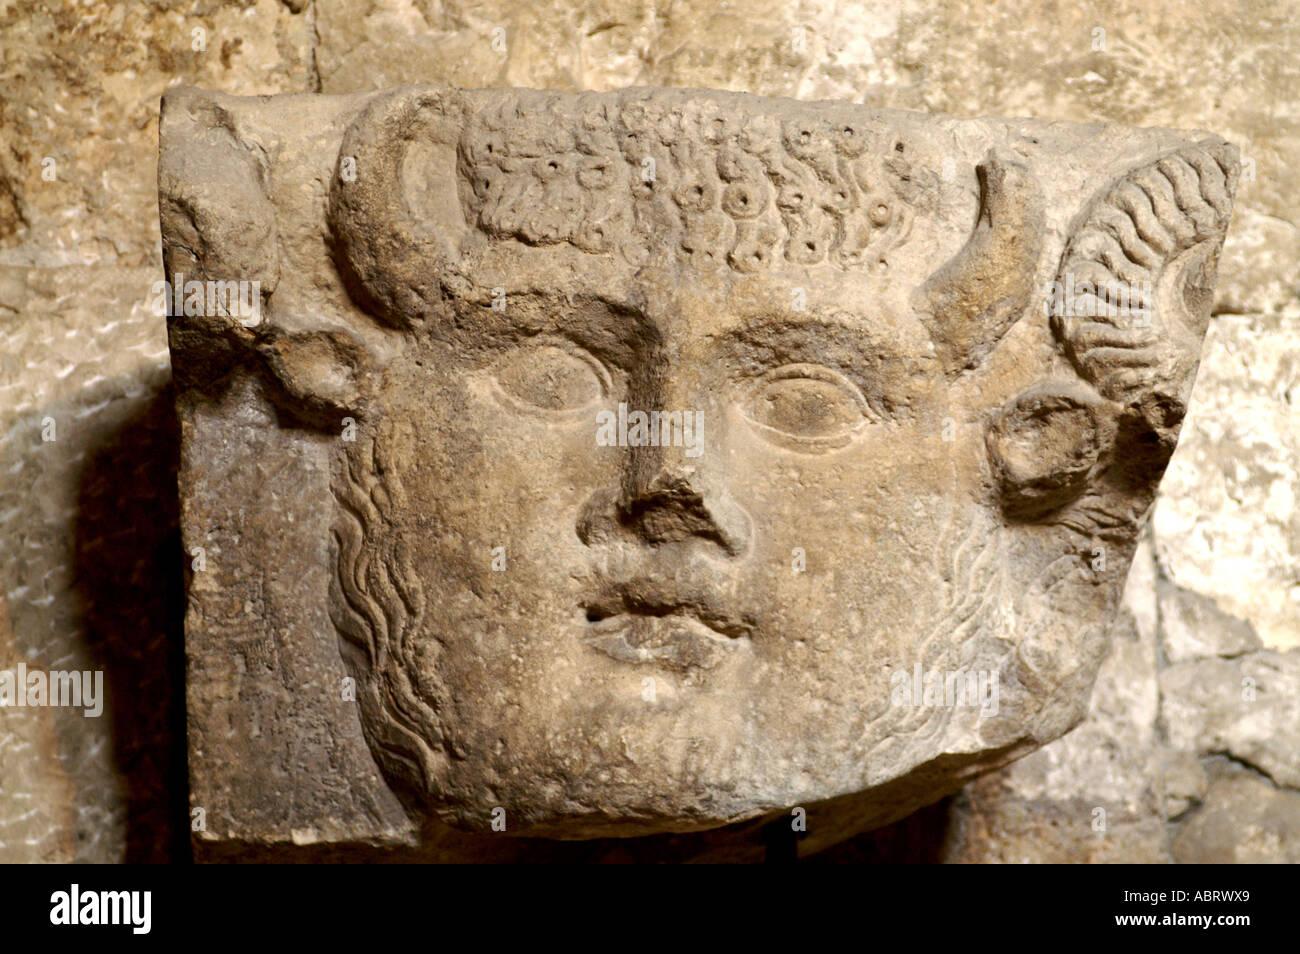 Pula pola istria croatia adriatic kvarner roman stone